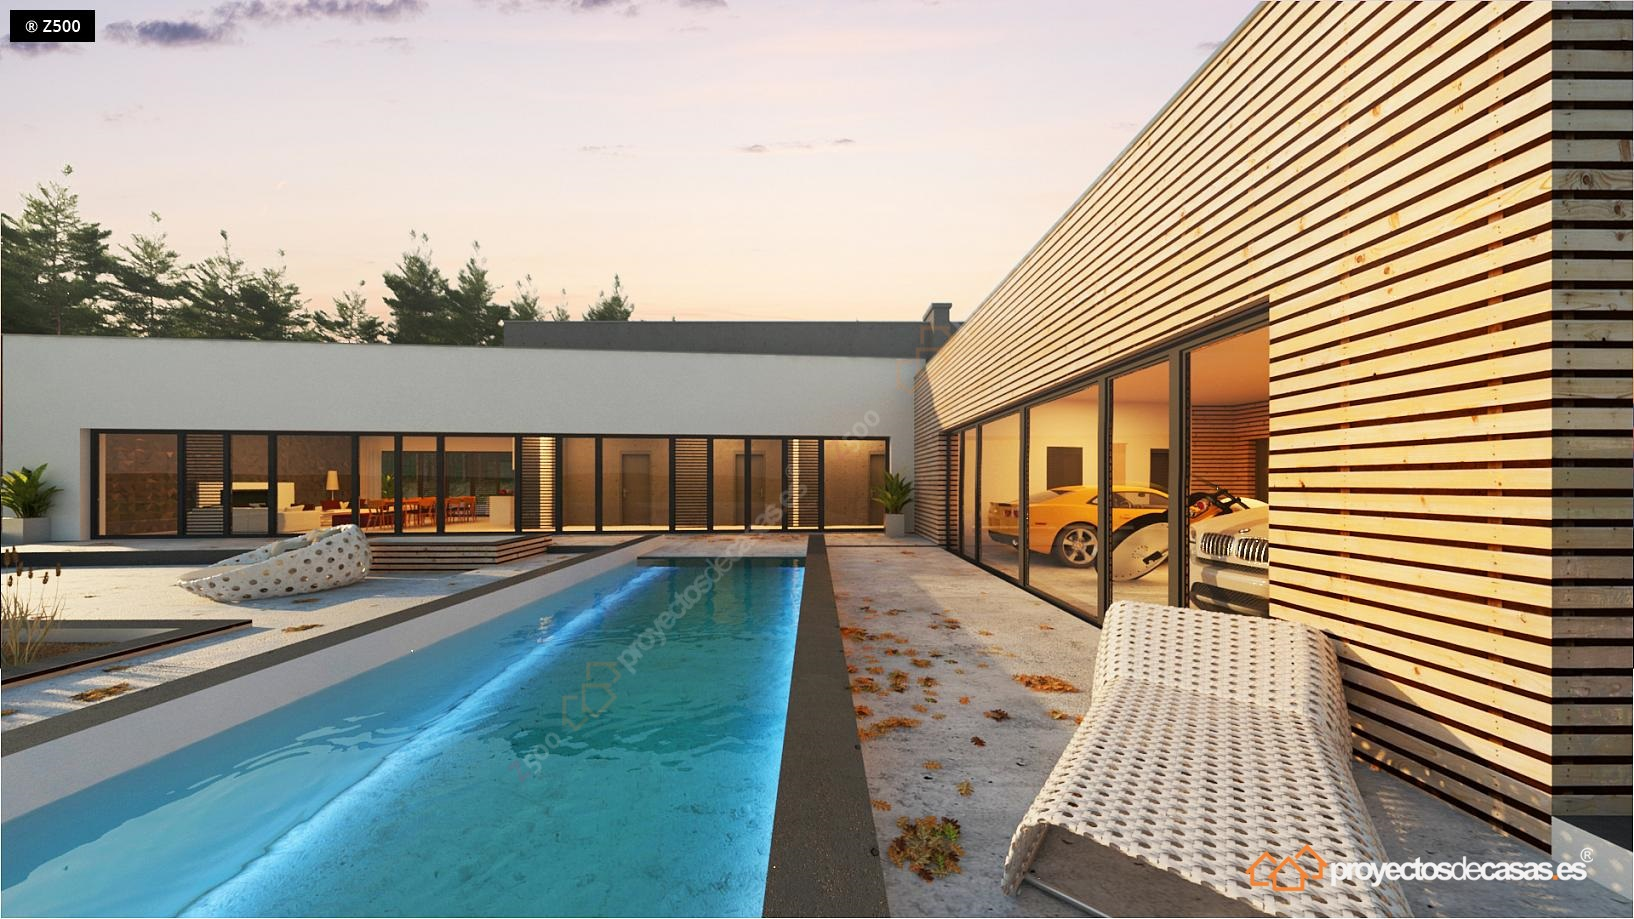 Casa moderna roca llisa con piscina y garaje a la vista for Casa moderna espana